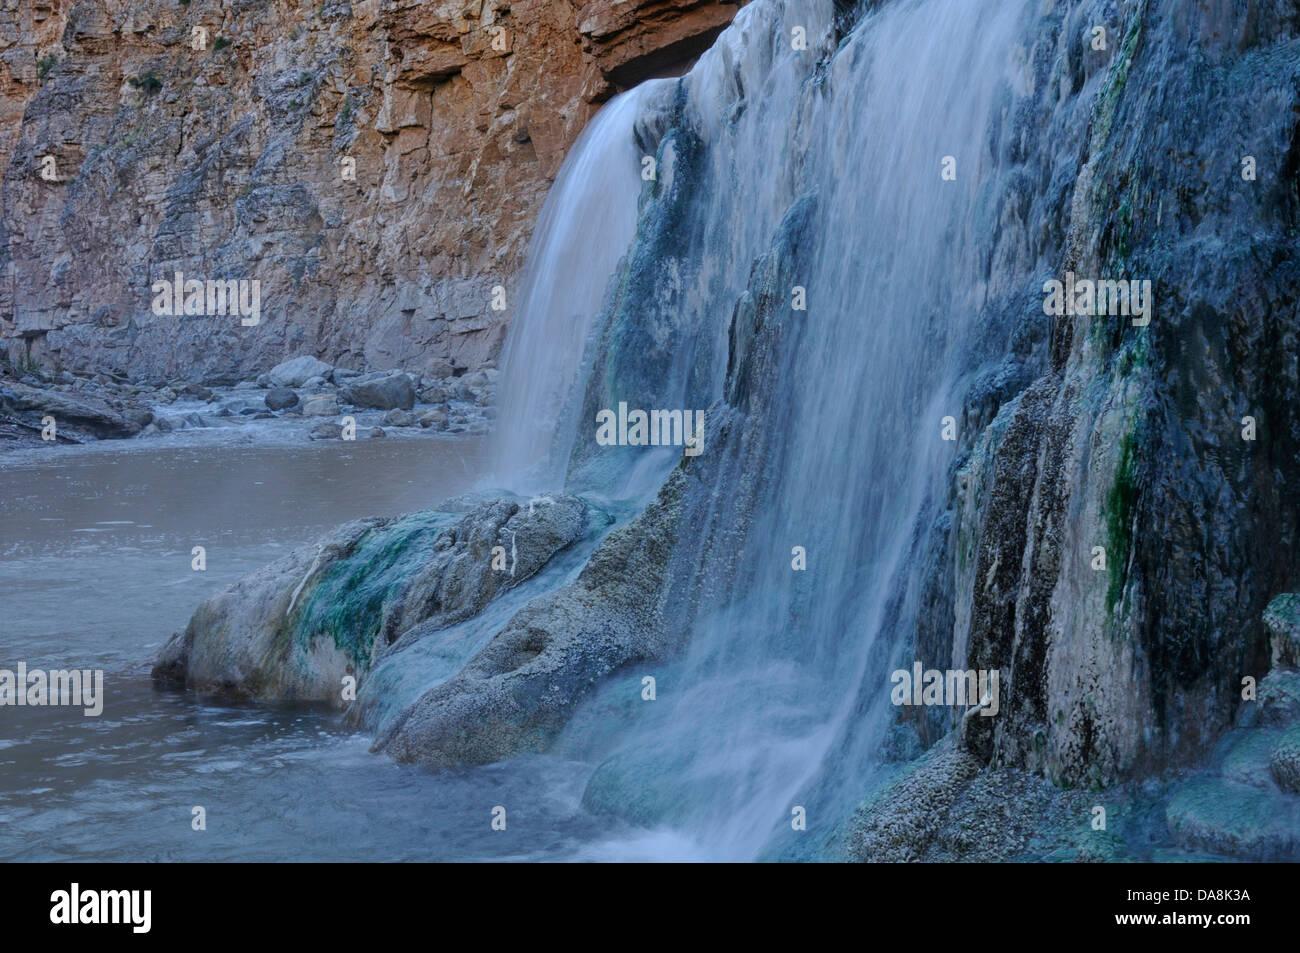 USA, United States, America, Utah, St. George, North America, four corners, Colorado, Plateau, Virgin River, Hot - Stock Image